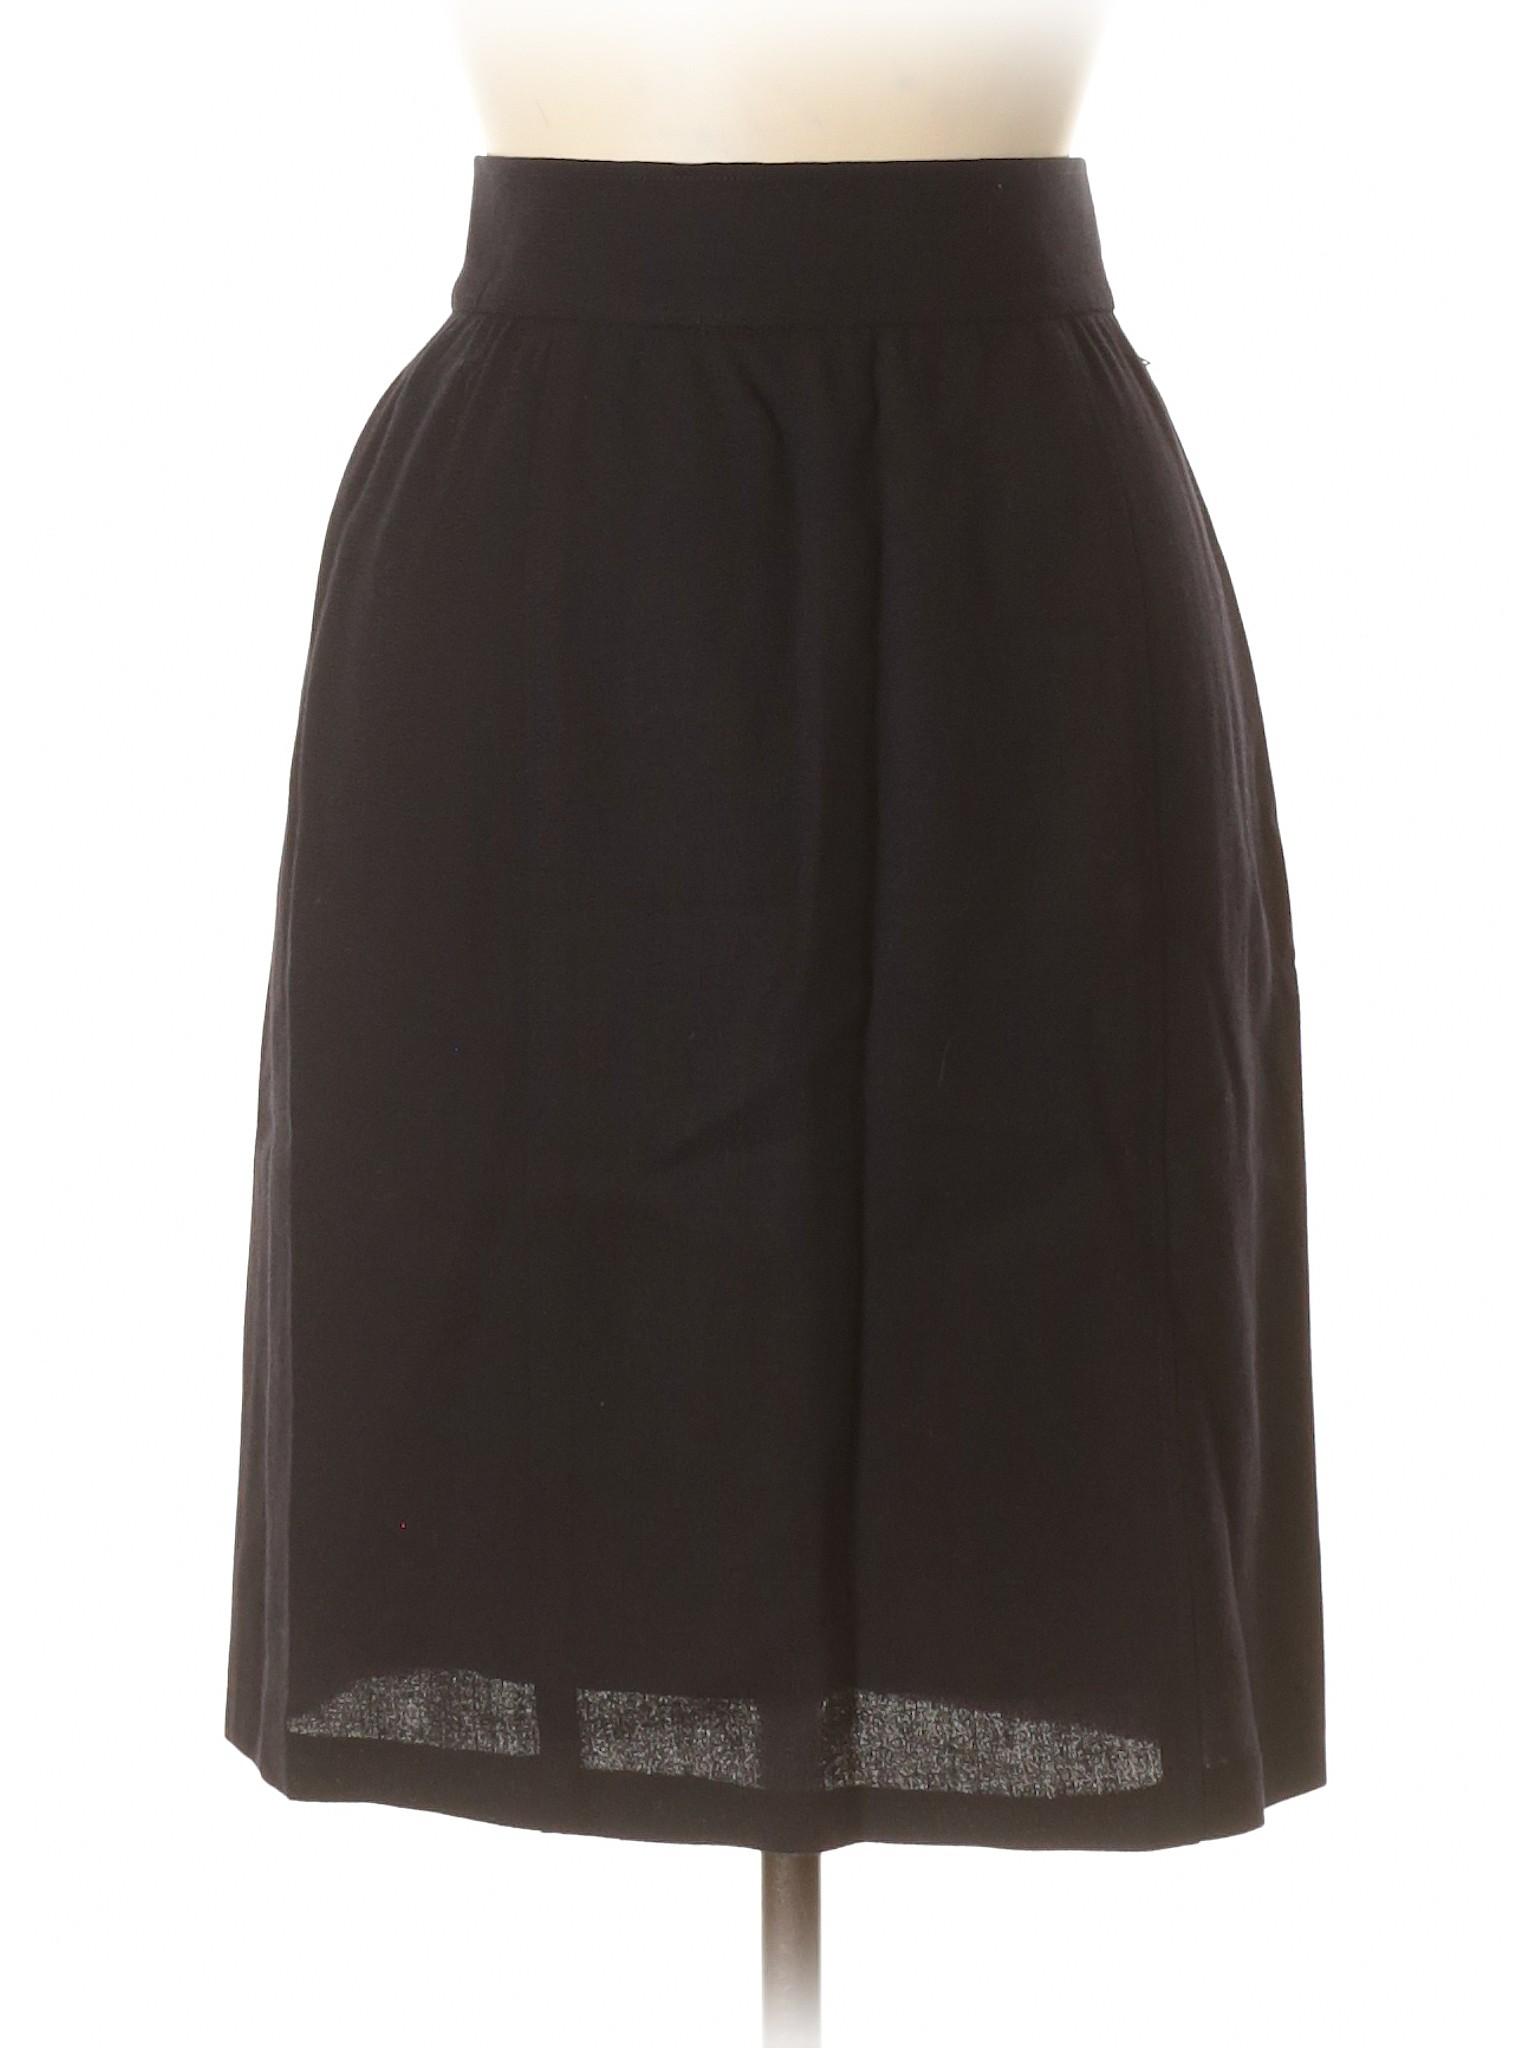 Boutique Boutique Boutique Casual Chloé Chloé Skirt Chloé Casual Casual Chloé Skirt Skirt Boutique IwEqaY